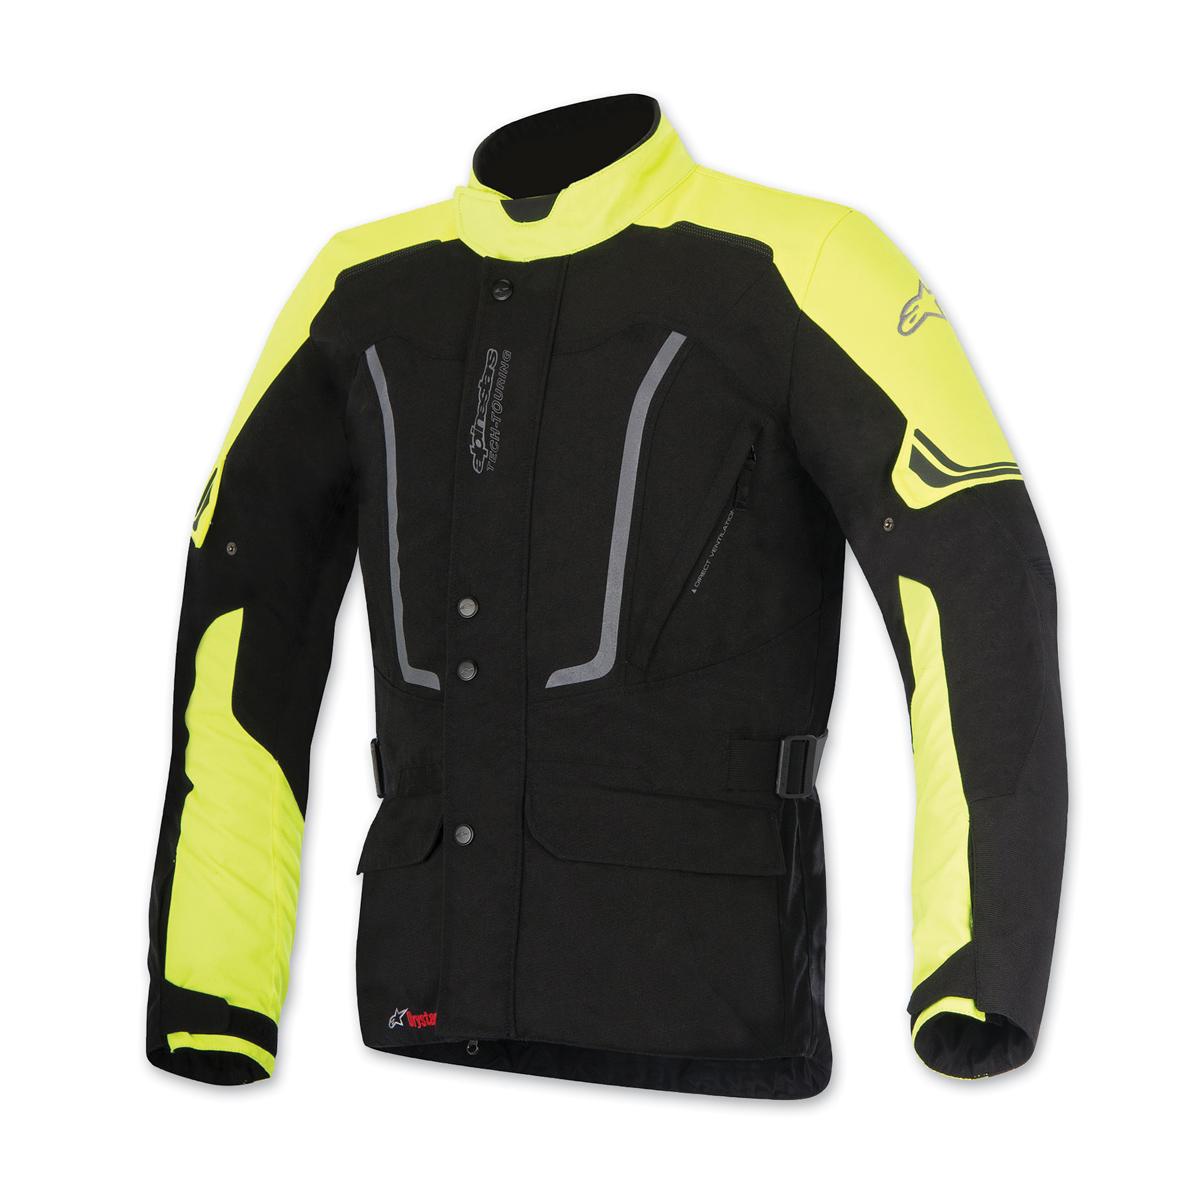 Alpinestars Men's Vence Drystar Black/Yellow Jacket